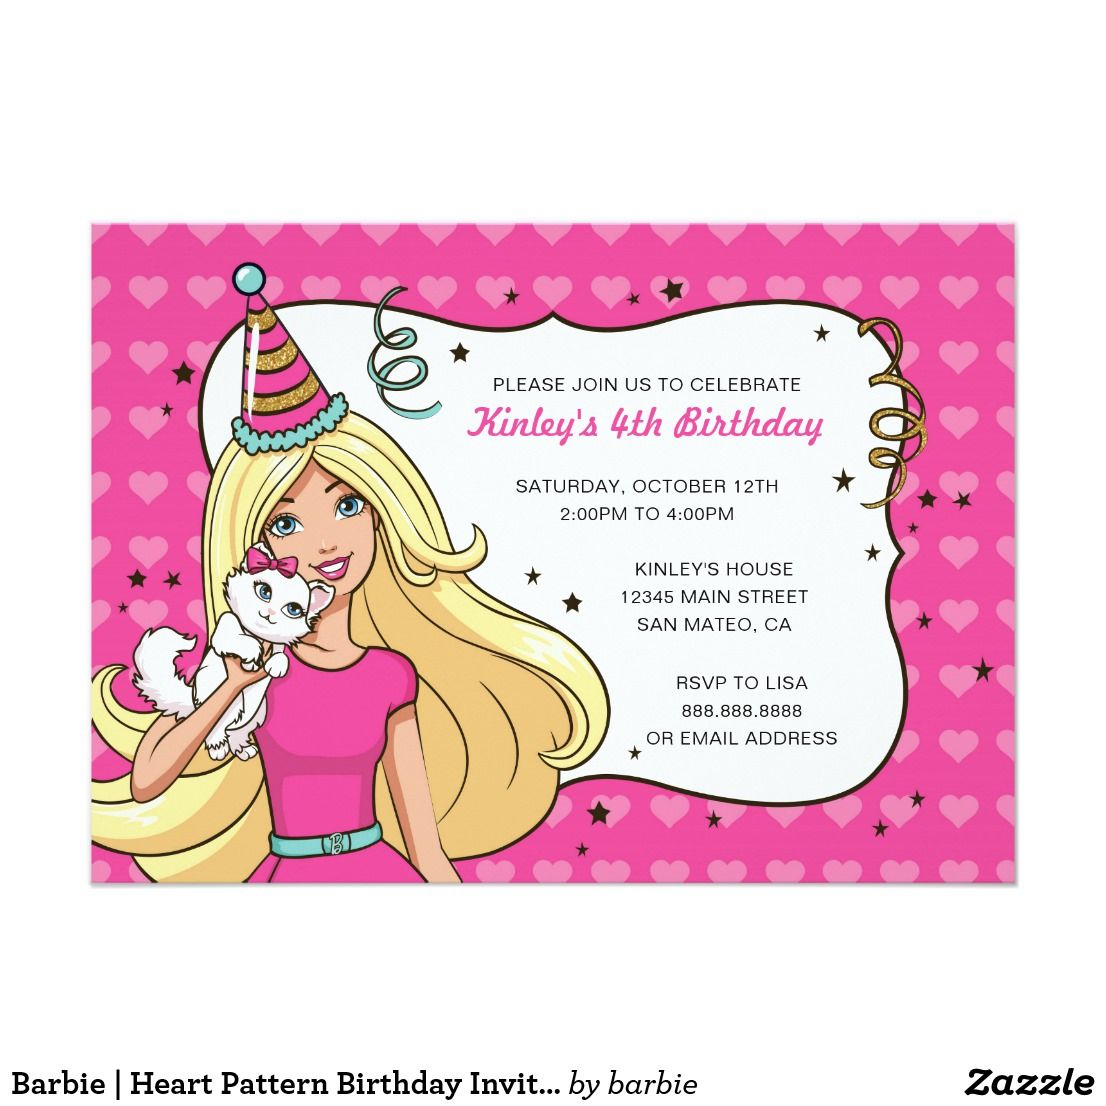 Barbie | Heart Pattern Birthday Invitation | Heart patterns